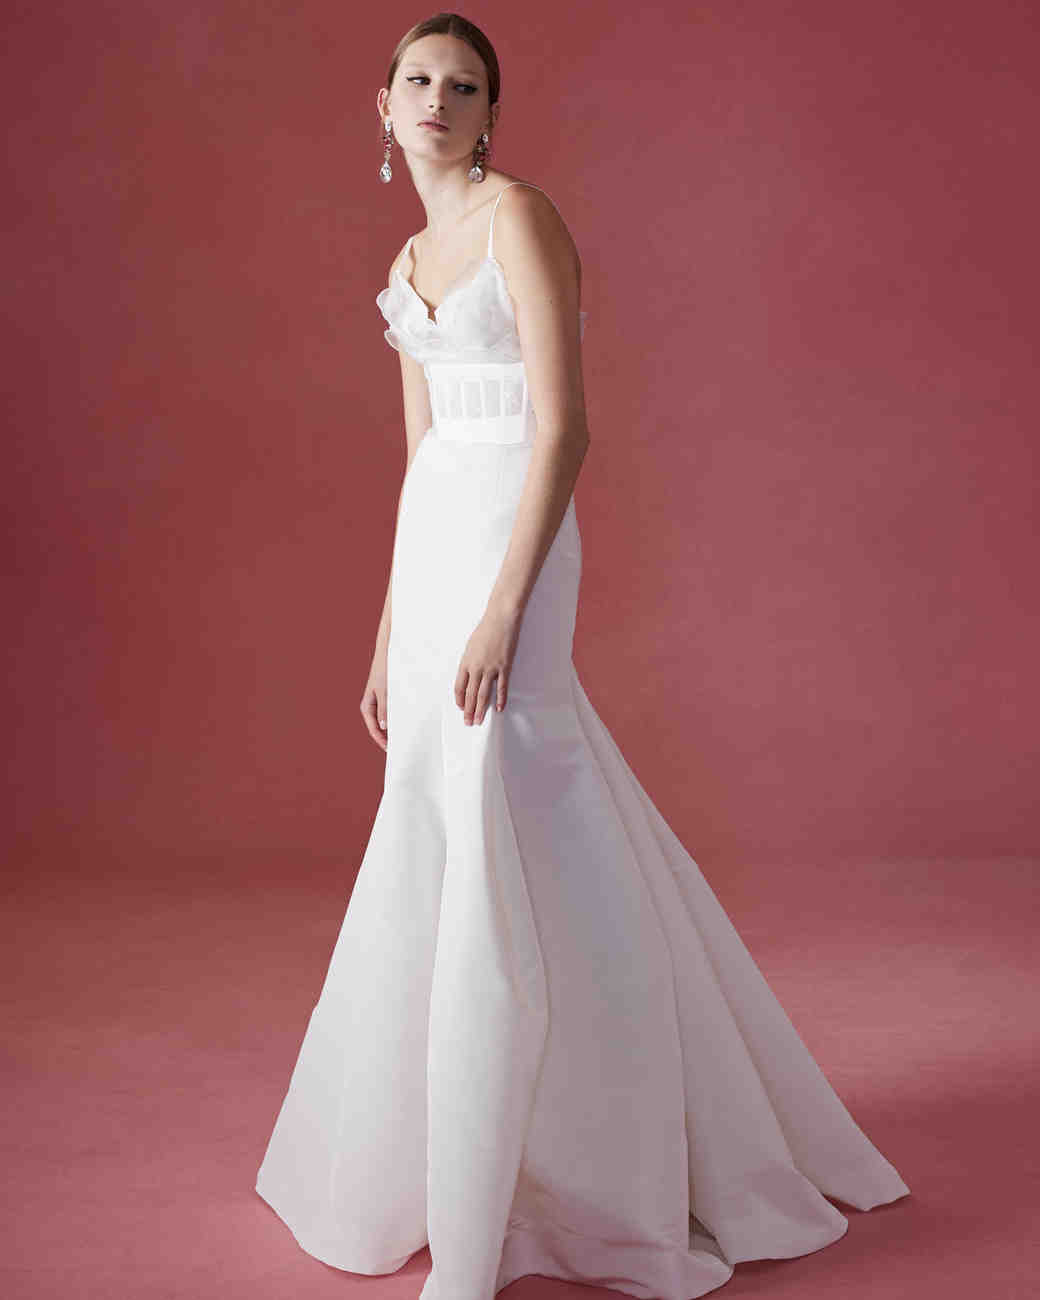 bridal fashion shows page 11 wedding dress for rent Oscar de la Renta Fall Wedding Dress Collection